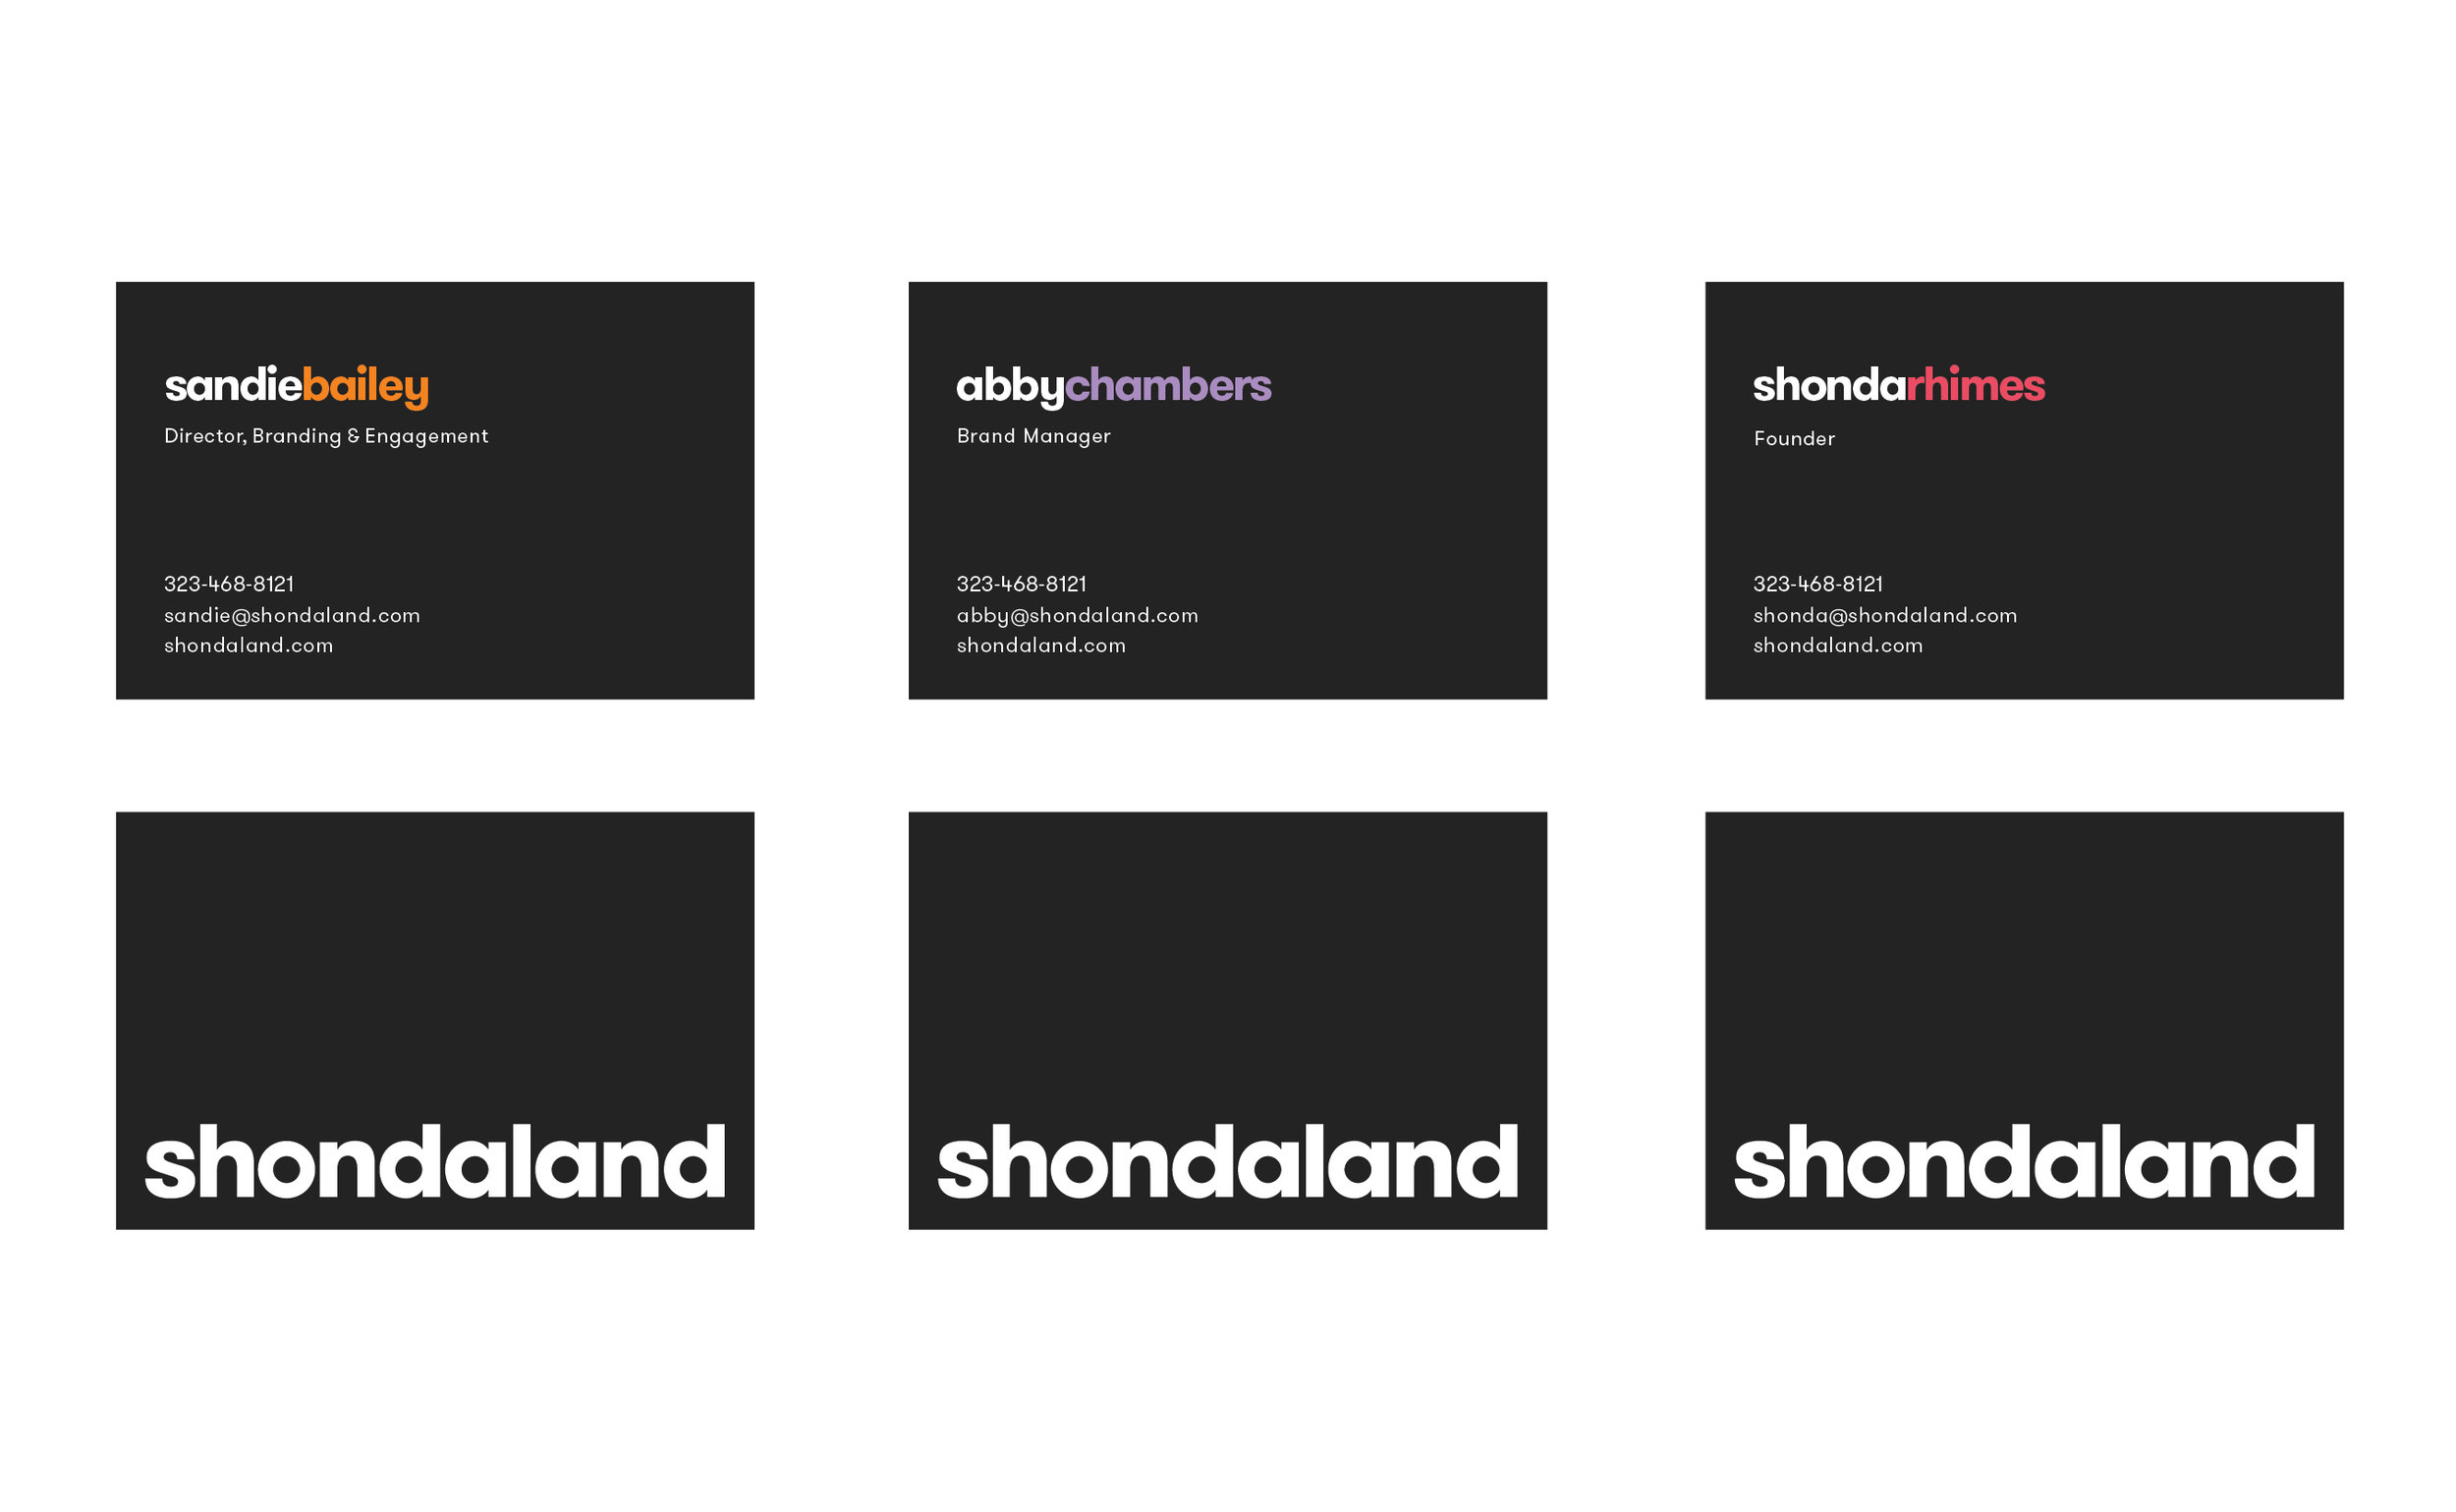 Shondaland_website_aptone_NEW-05.jpg